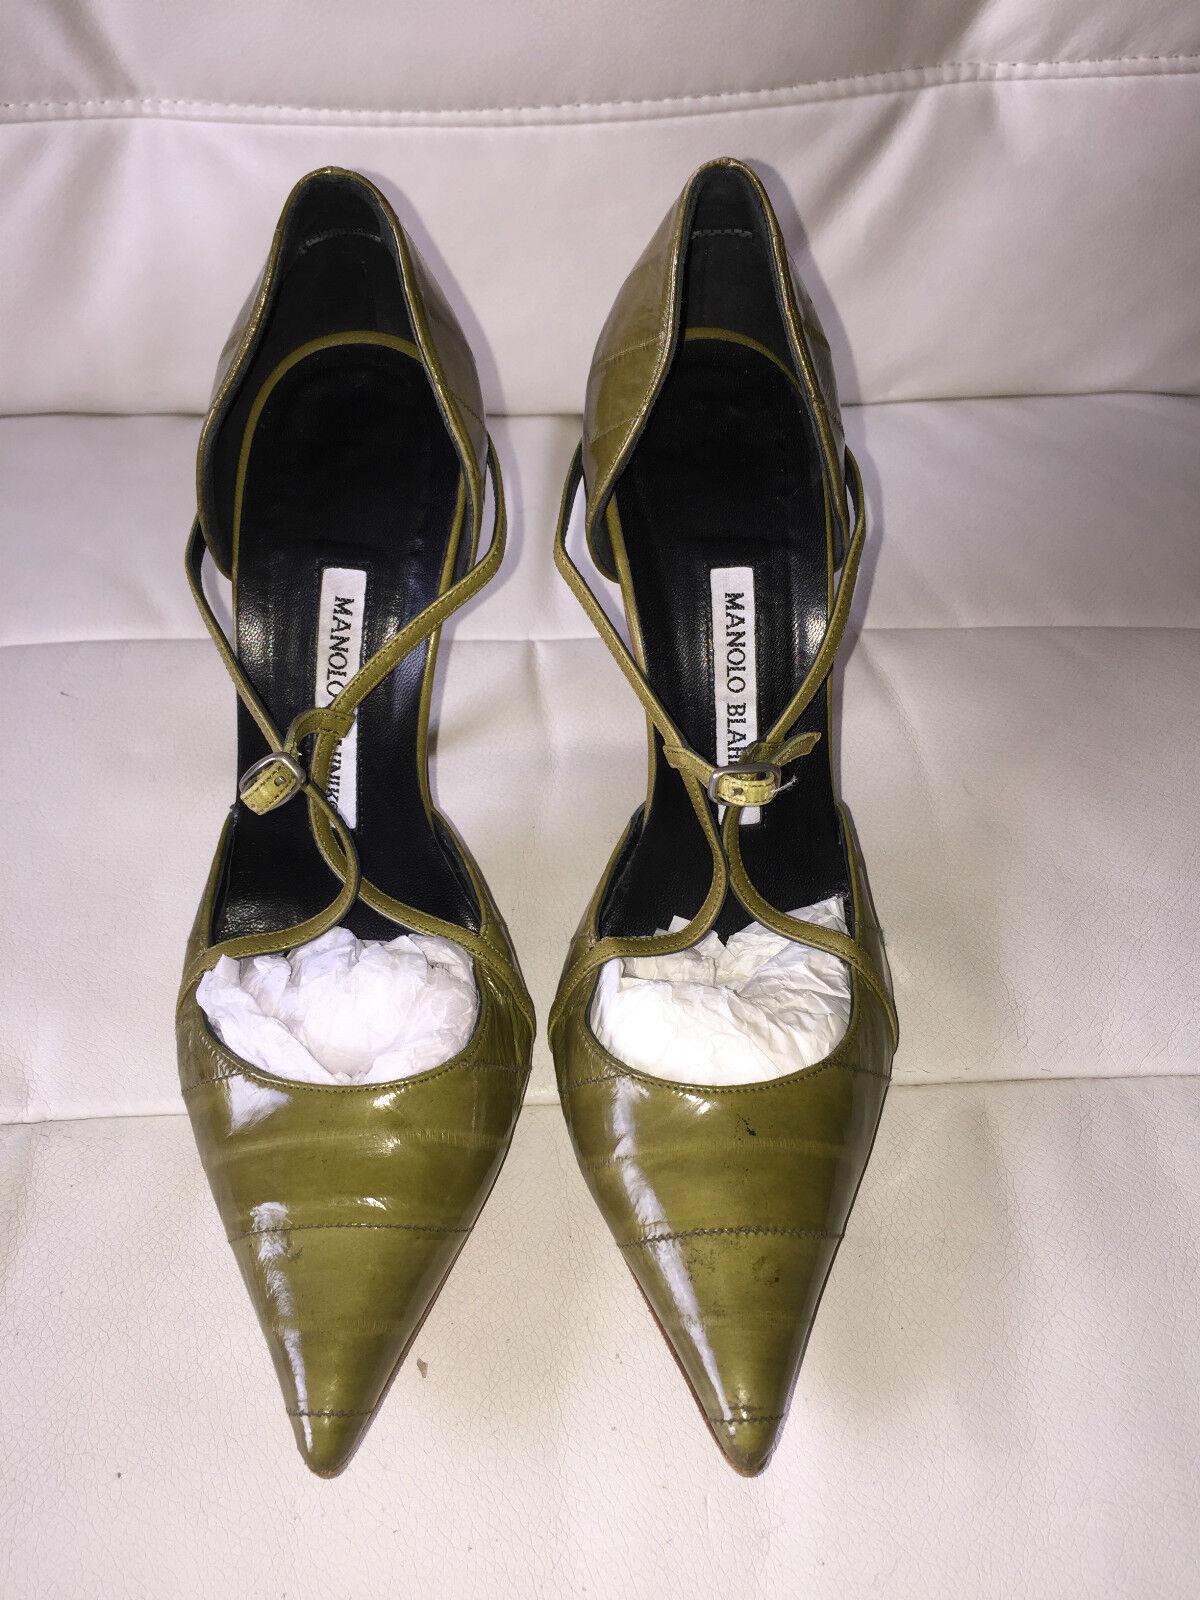 600 Manolo Blahnik Blahnik Blahnik Green Leather Pump Dorsay shoes 37 4feccd